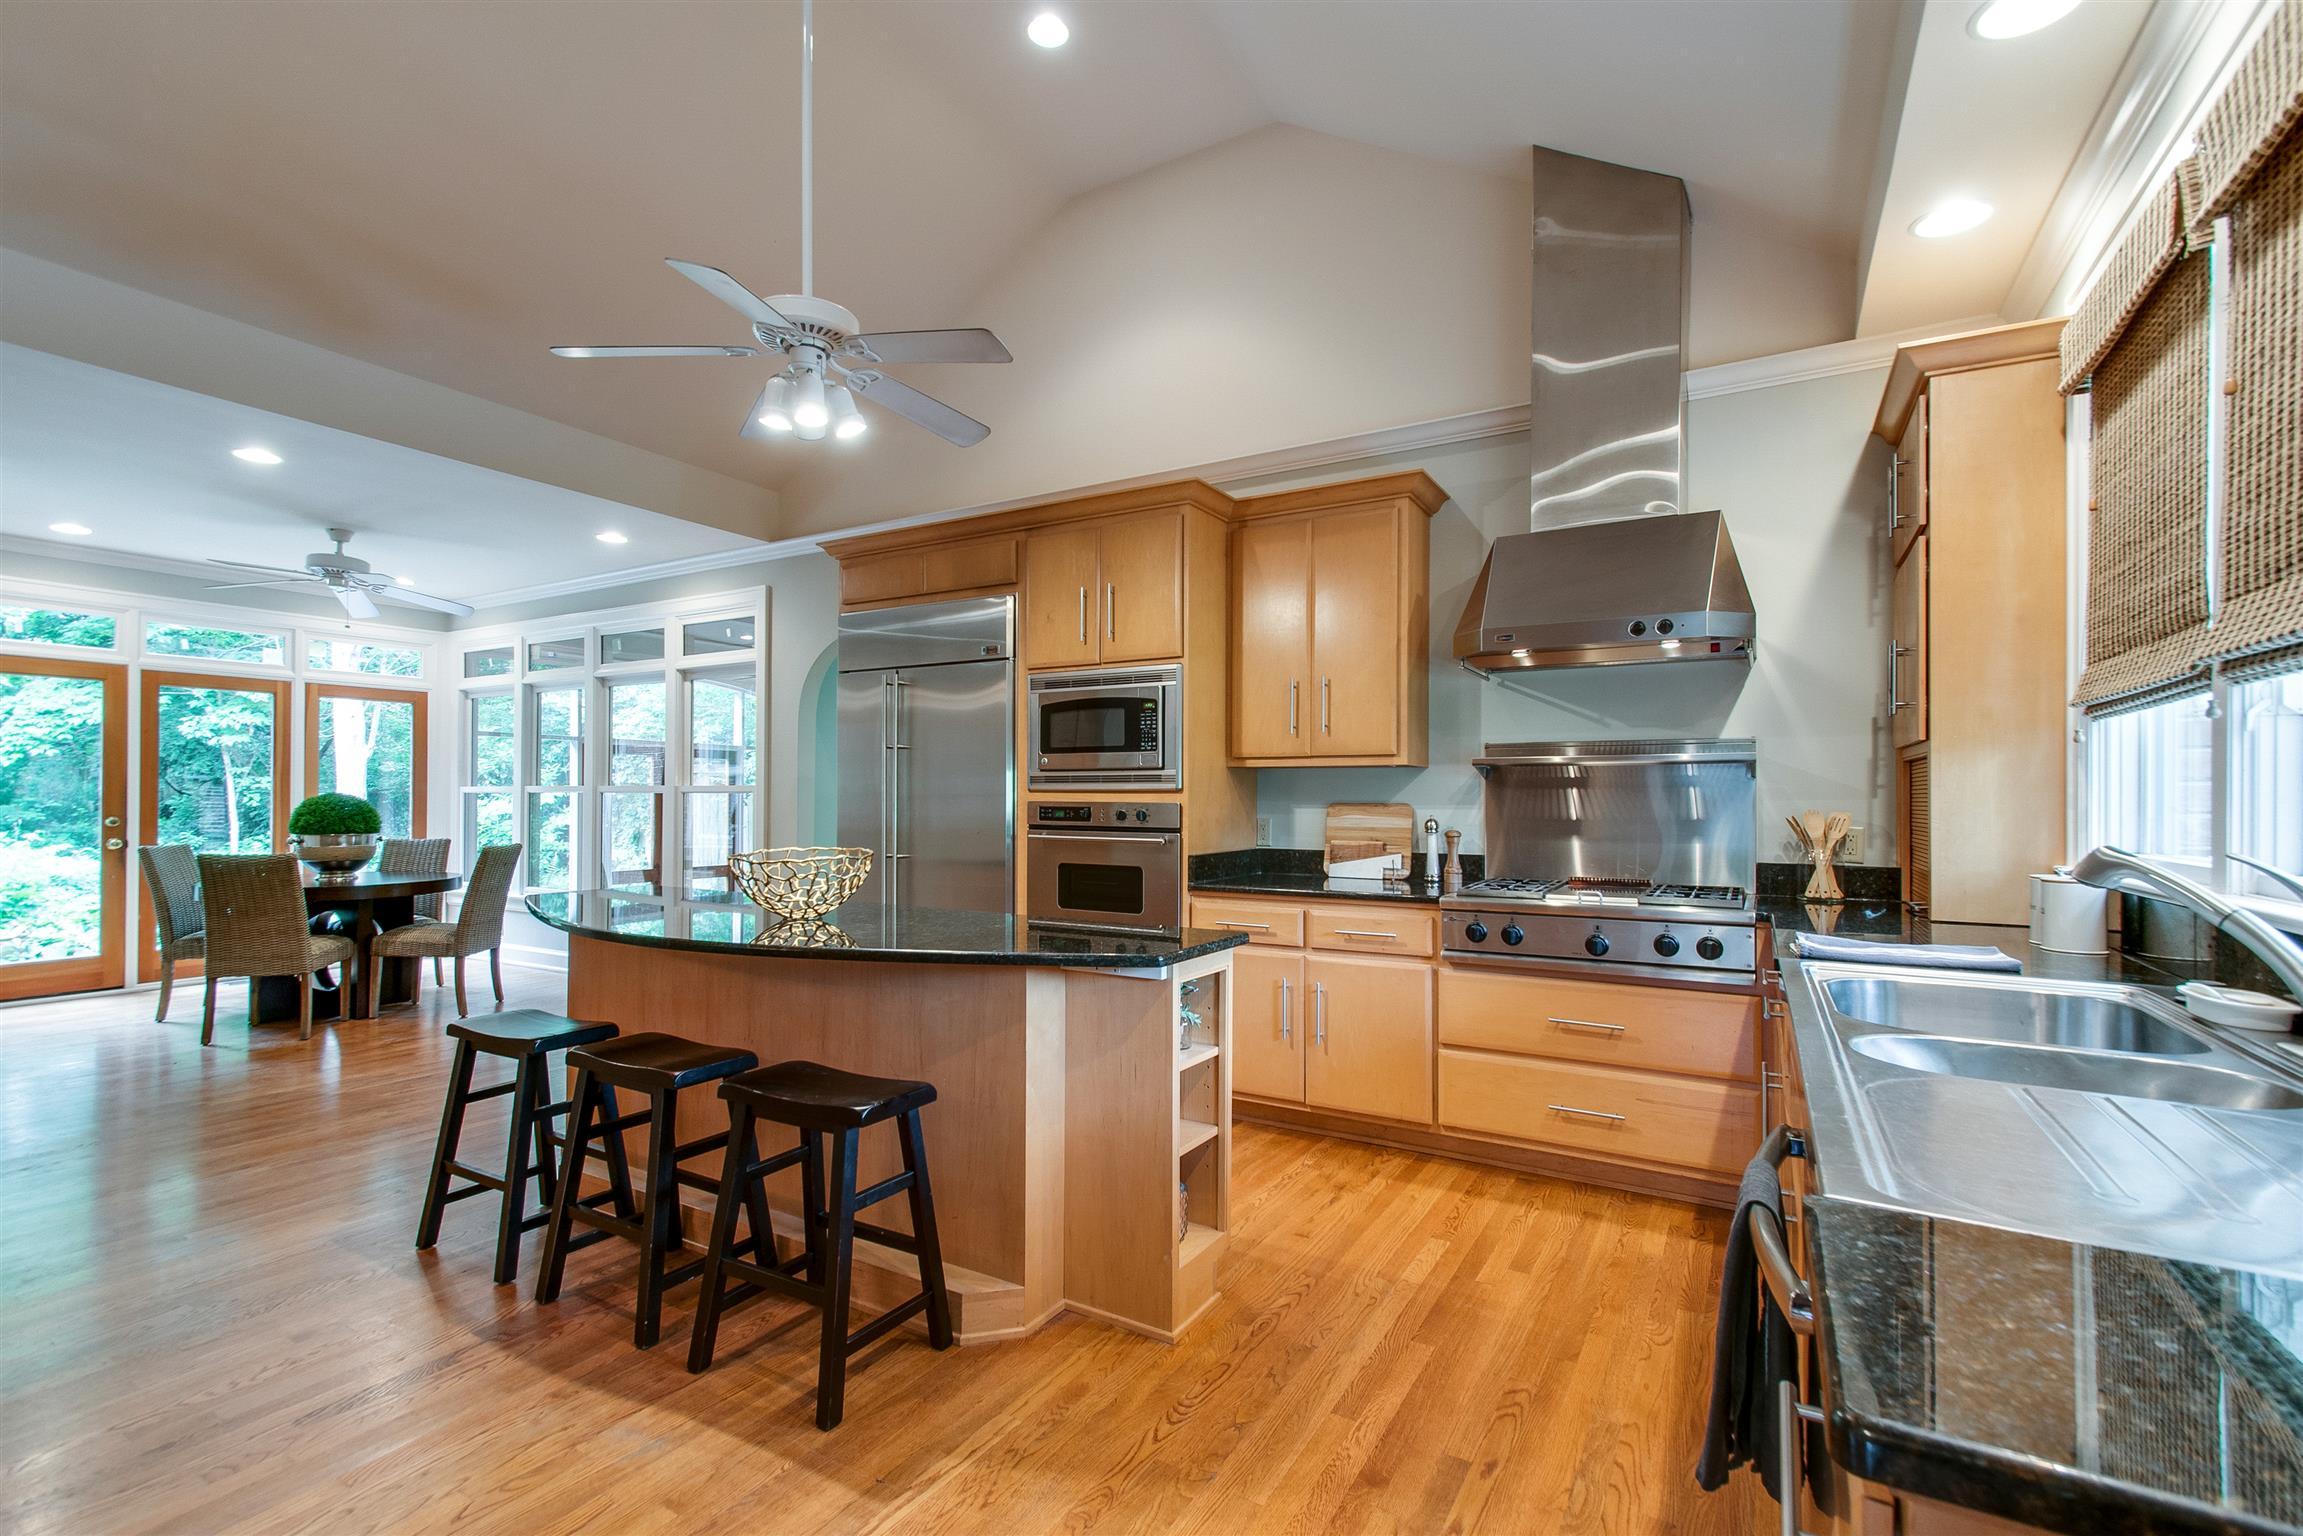 Nashville - Green Hills Homes for Sale -  Two Story,  3016 New Natchez Trce